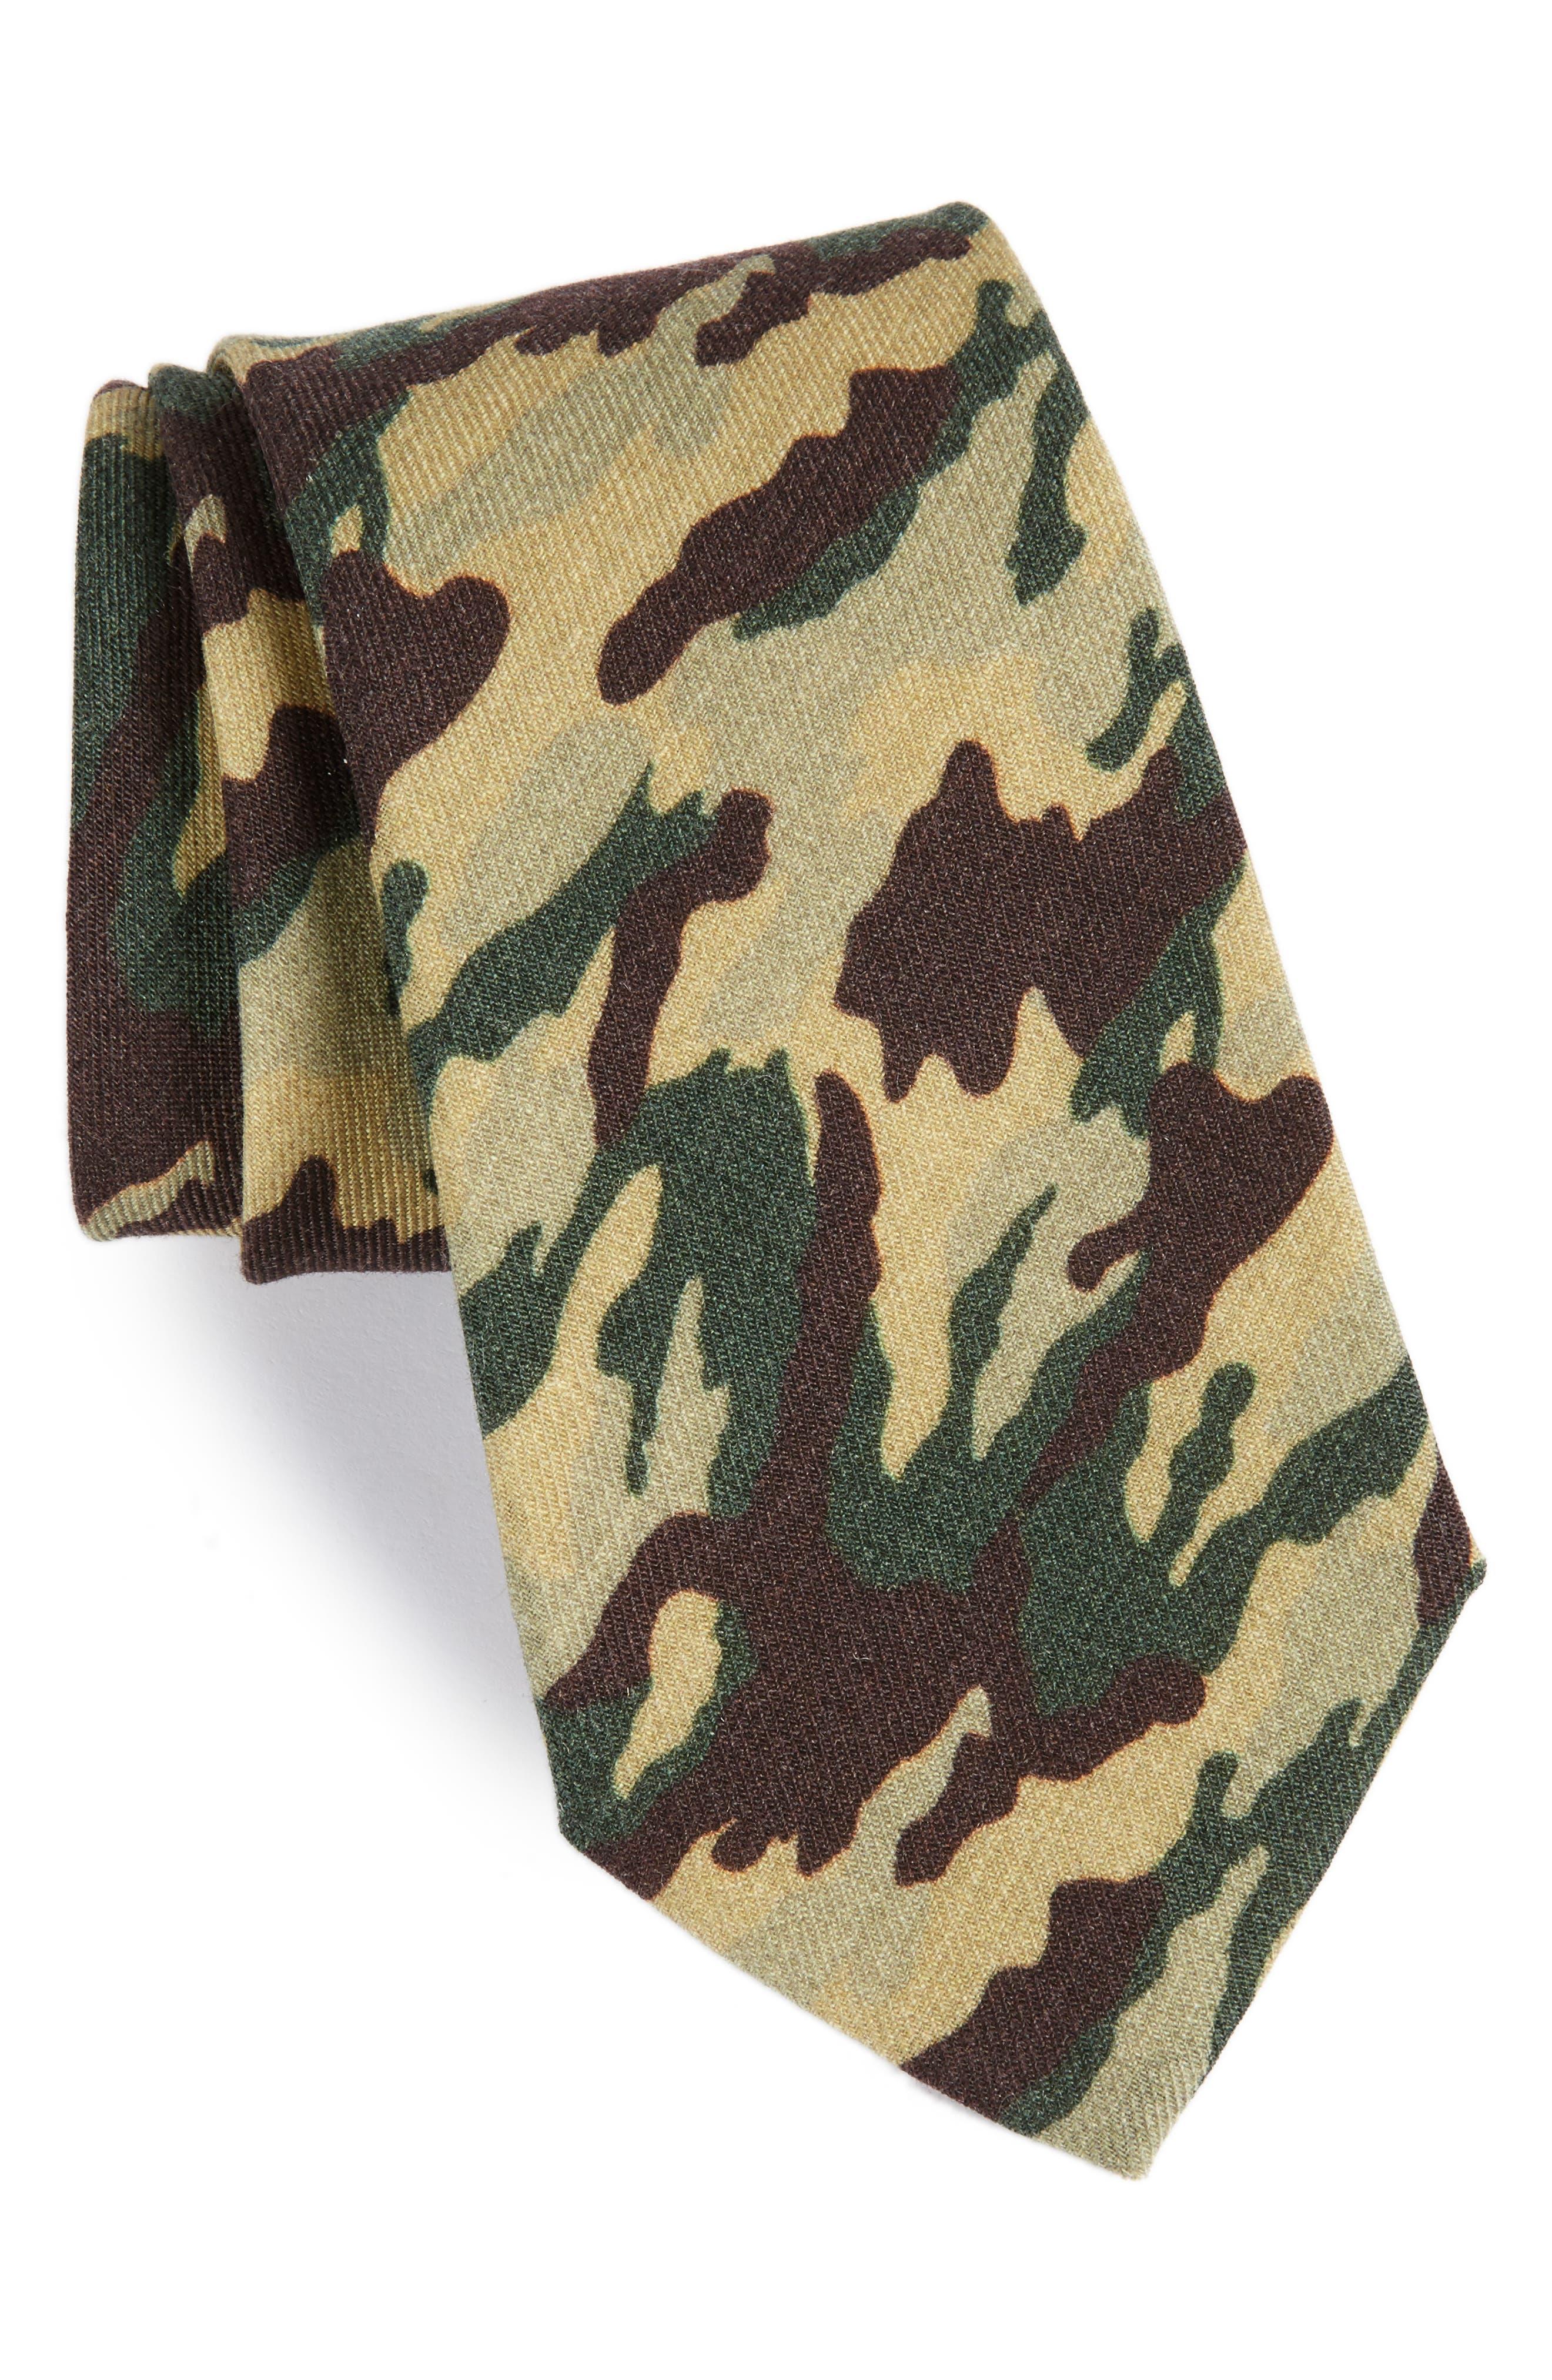 MICHAEL BASTIAN Camo Print Wool Tie